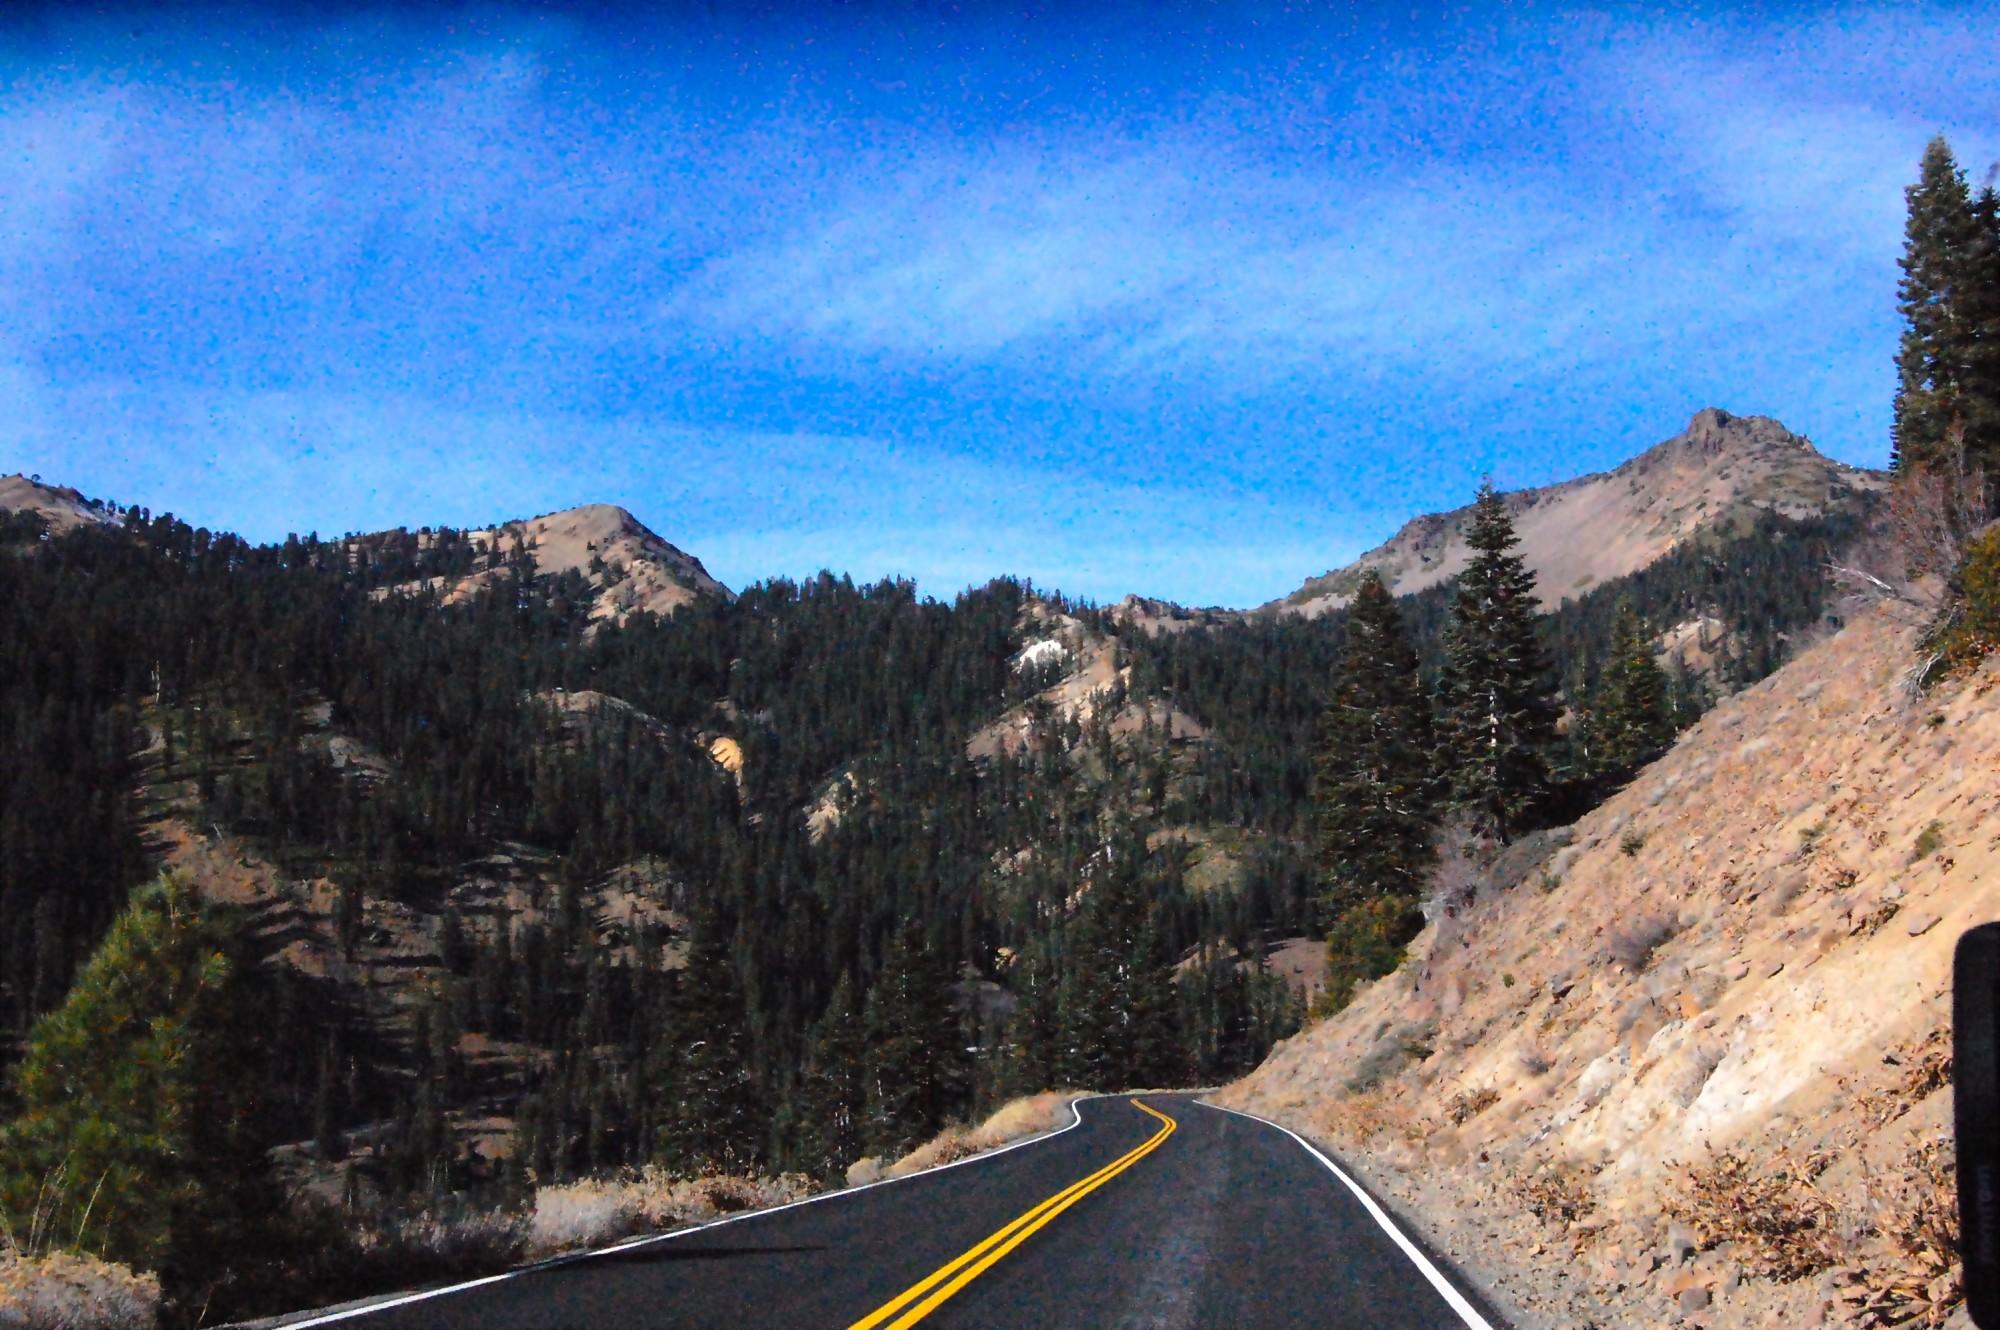 Road at Lassen Volcanic National Park